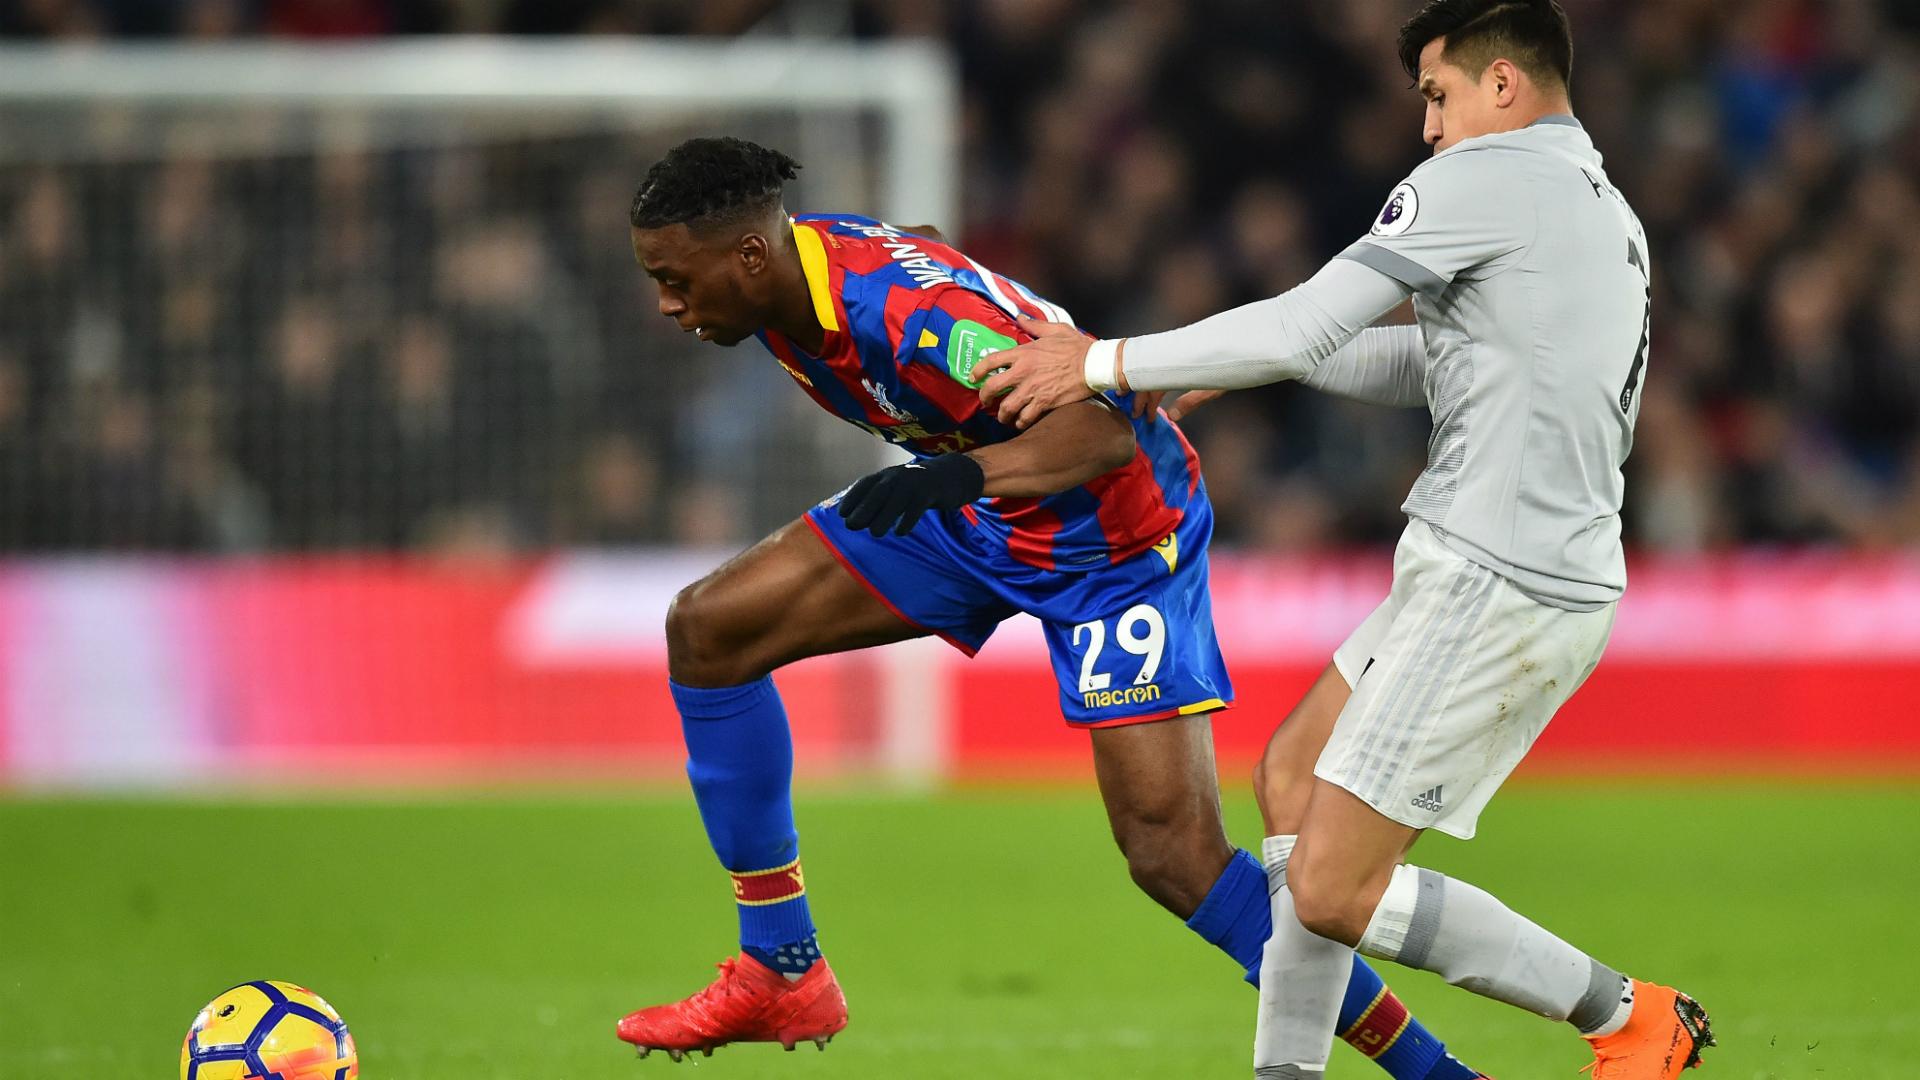 Aaron Wan-Bissaka Alexis Sanchez Crystal Palace Manchester United